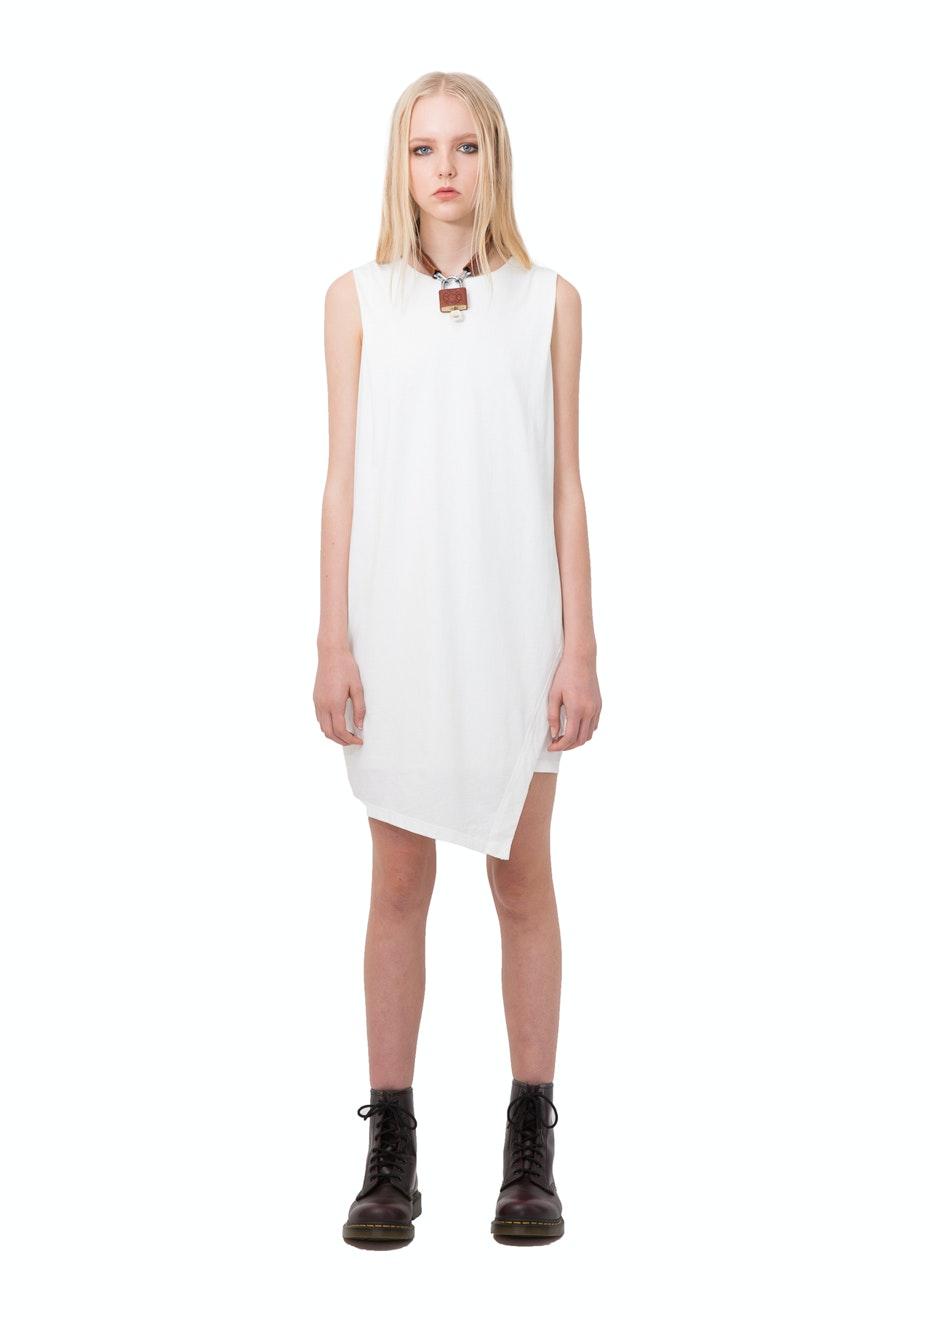 Stolen Girlfriends Club - Circuit Breaker Dress White - White